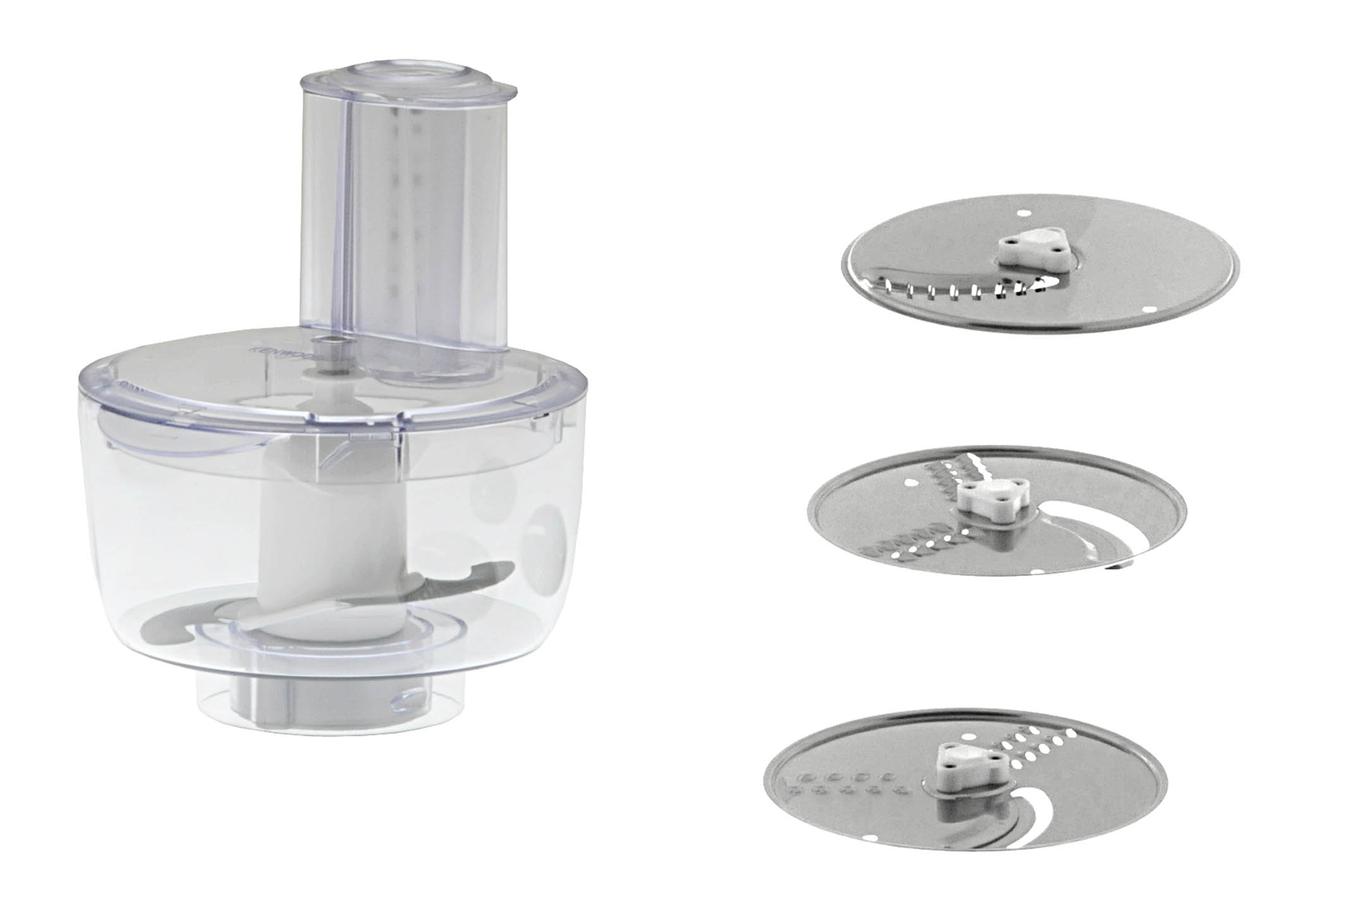 accessoire robot kenwood at640b bol multipro at640b 1292811 darty. Black Bedroom Furniture Sets. Home Design Ideas